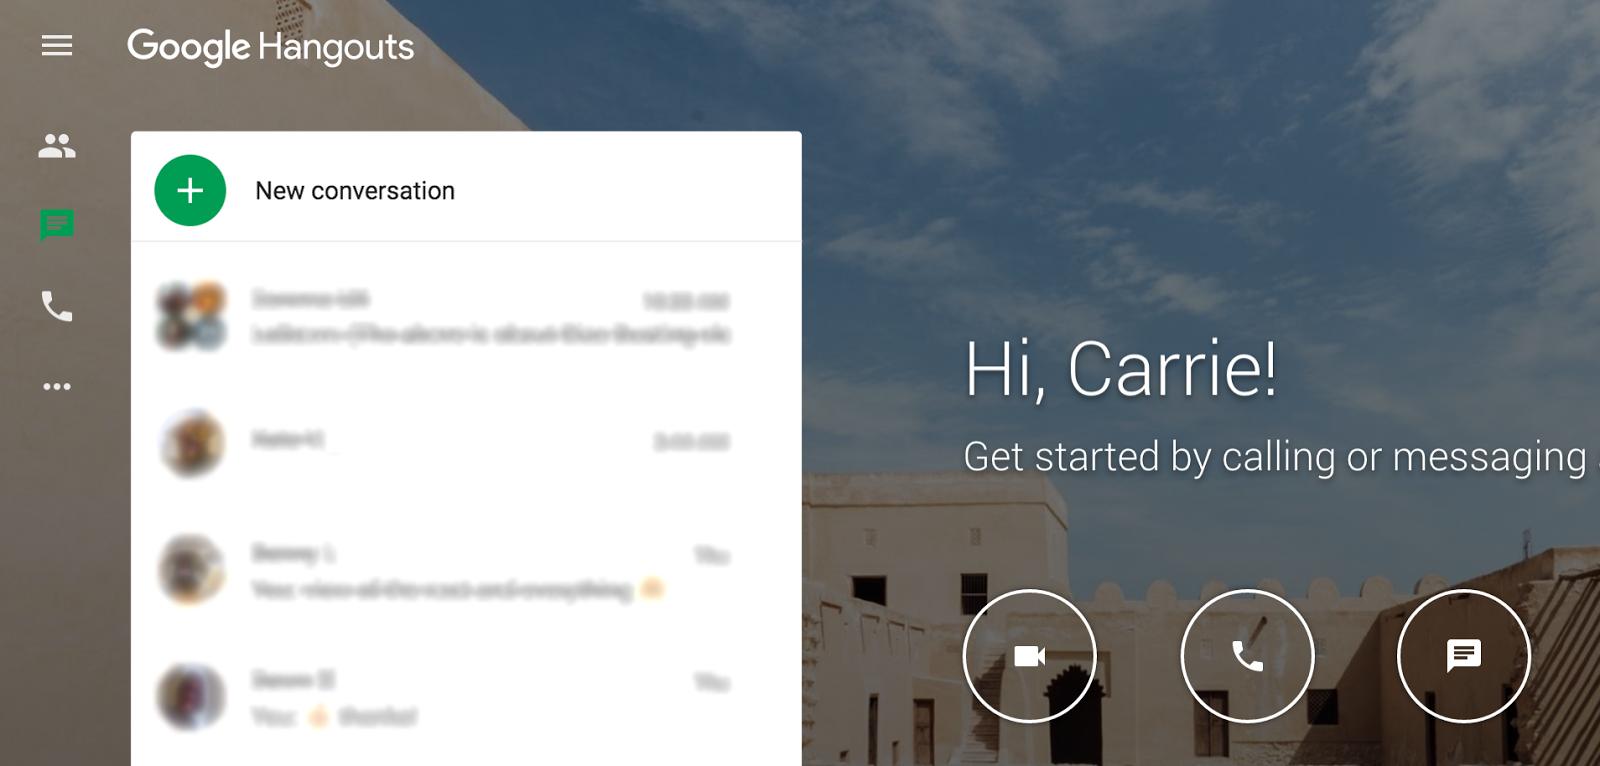 Google Hangouts New Conversation button 3